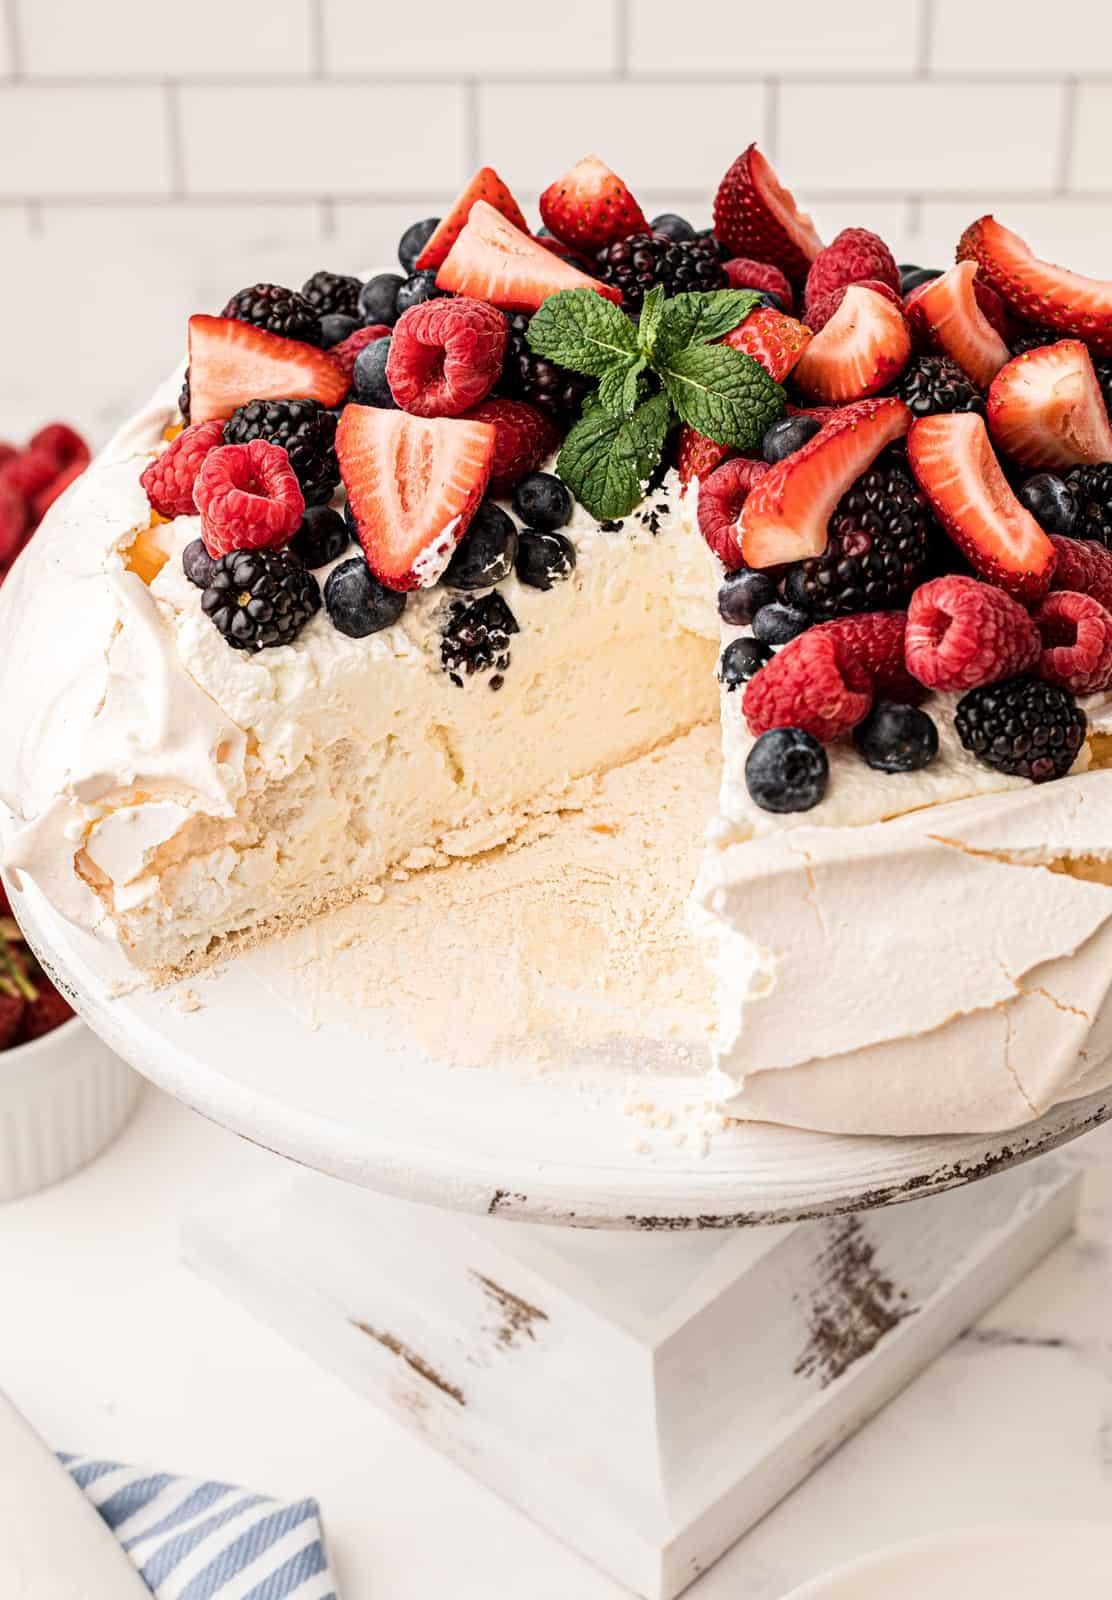 Slice missing from Pavlova recipe on cake stand